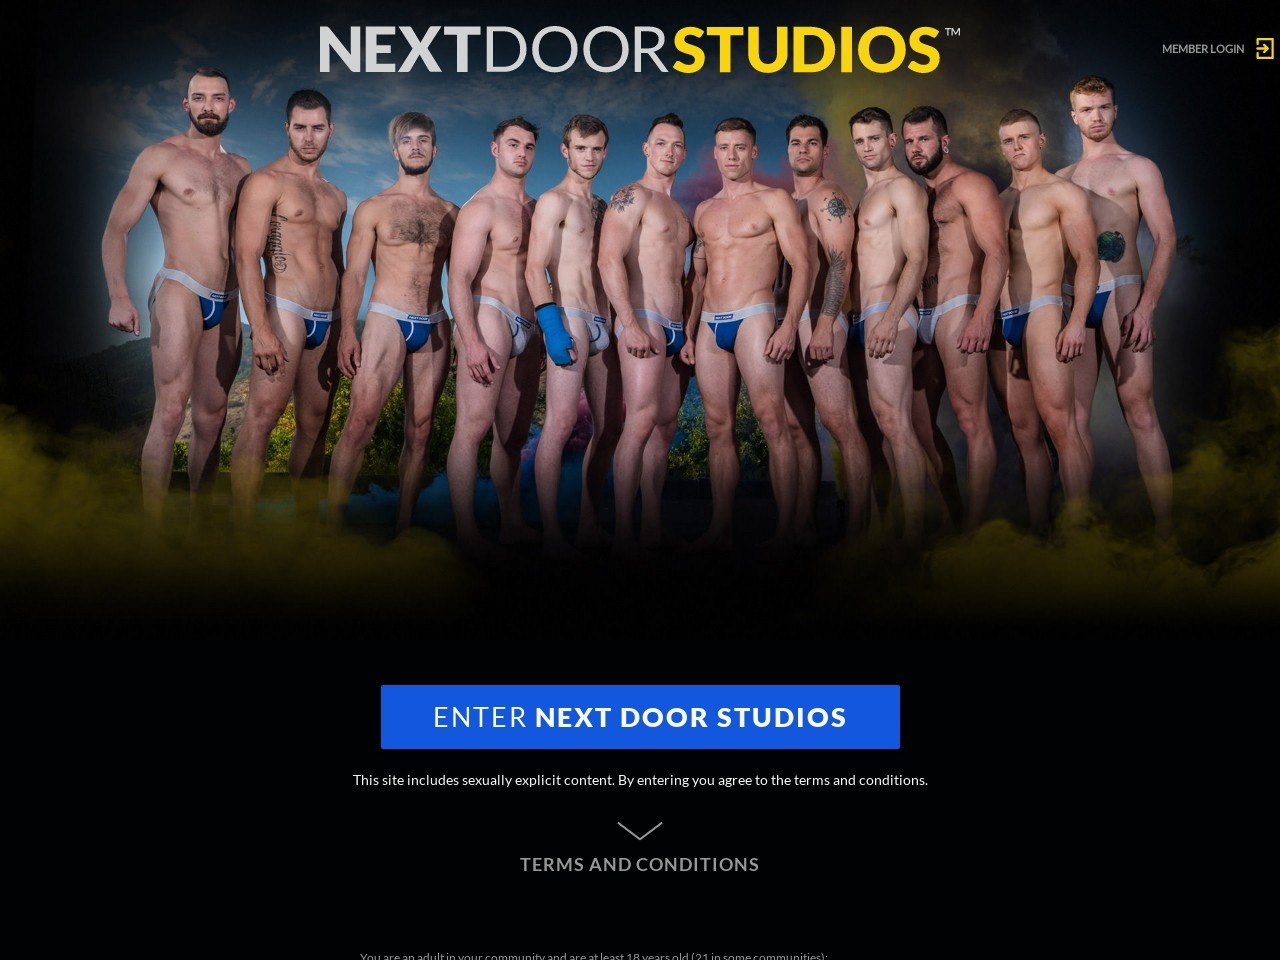 Next Door Studios - Gay Porn XXX Site & Male Sex Videos